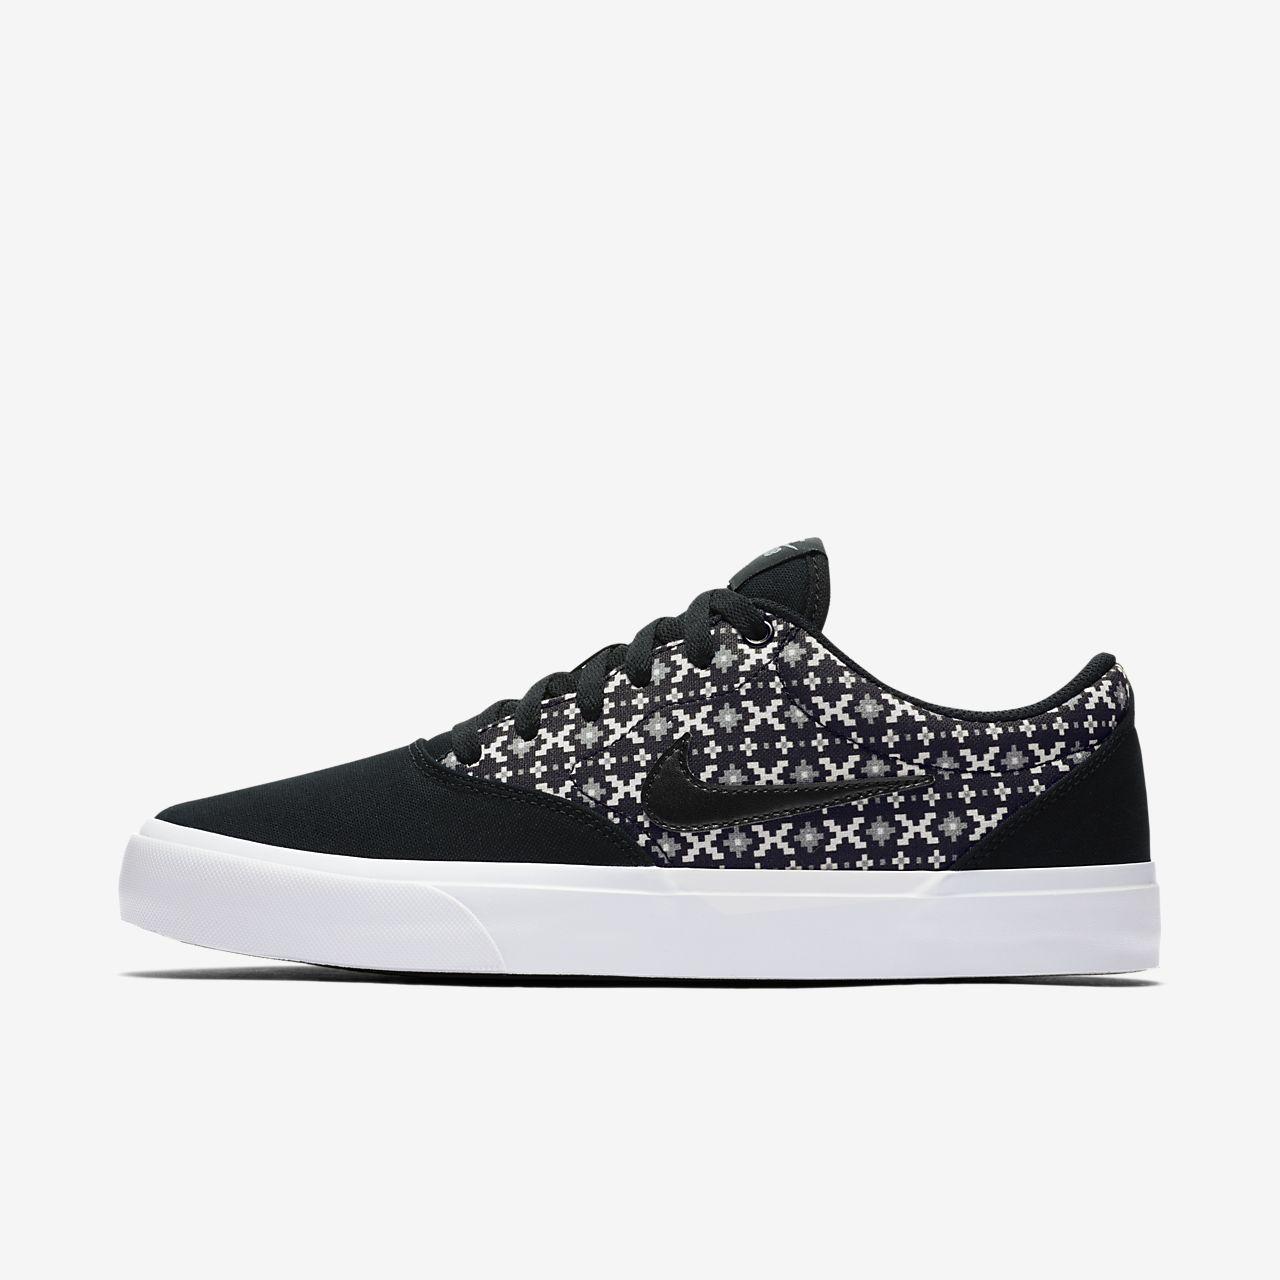 Buty do skateboardingu Nike SB Charge Premium